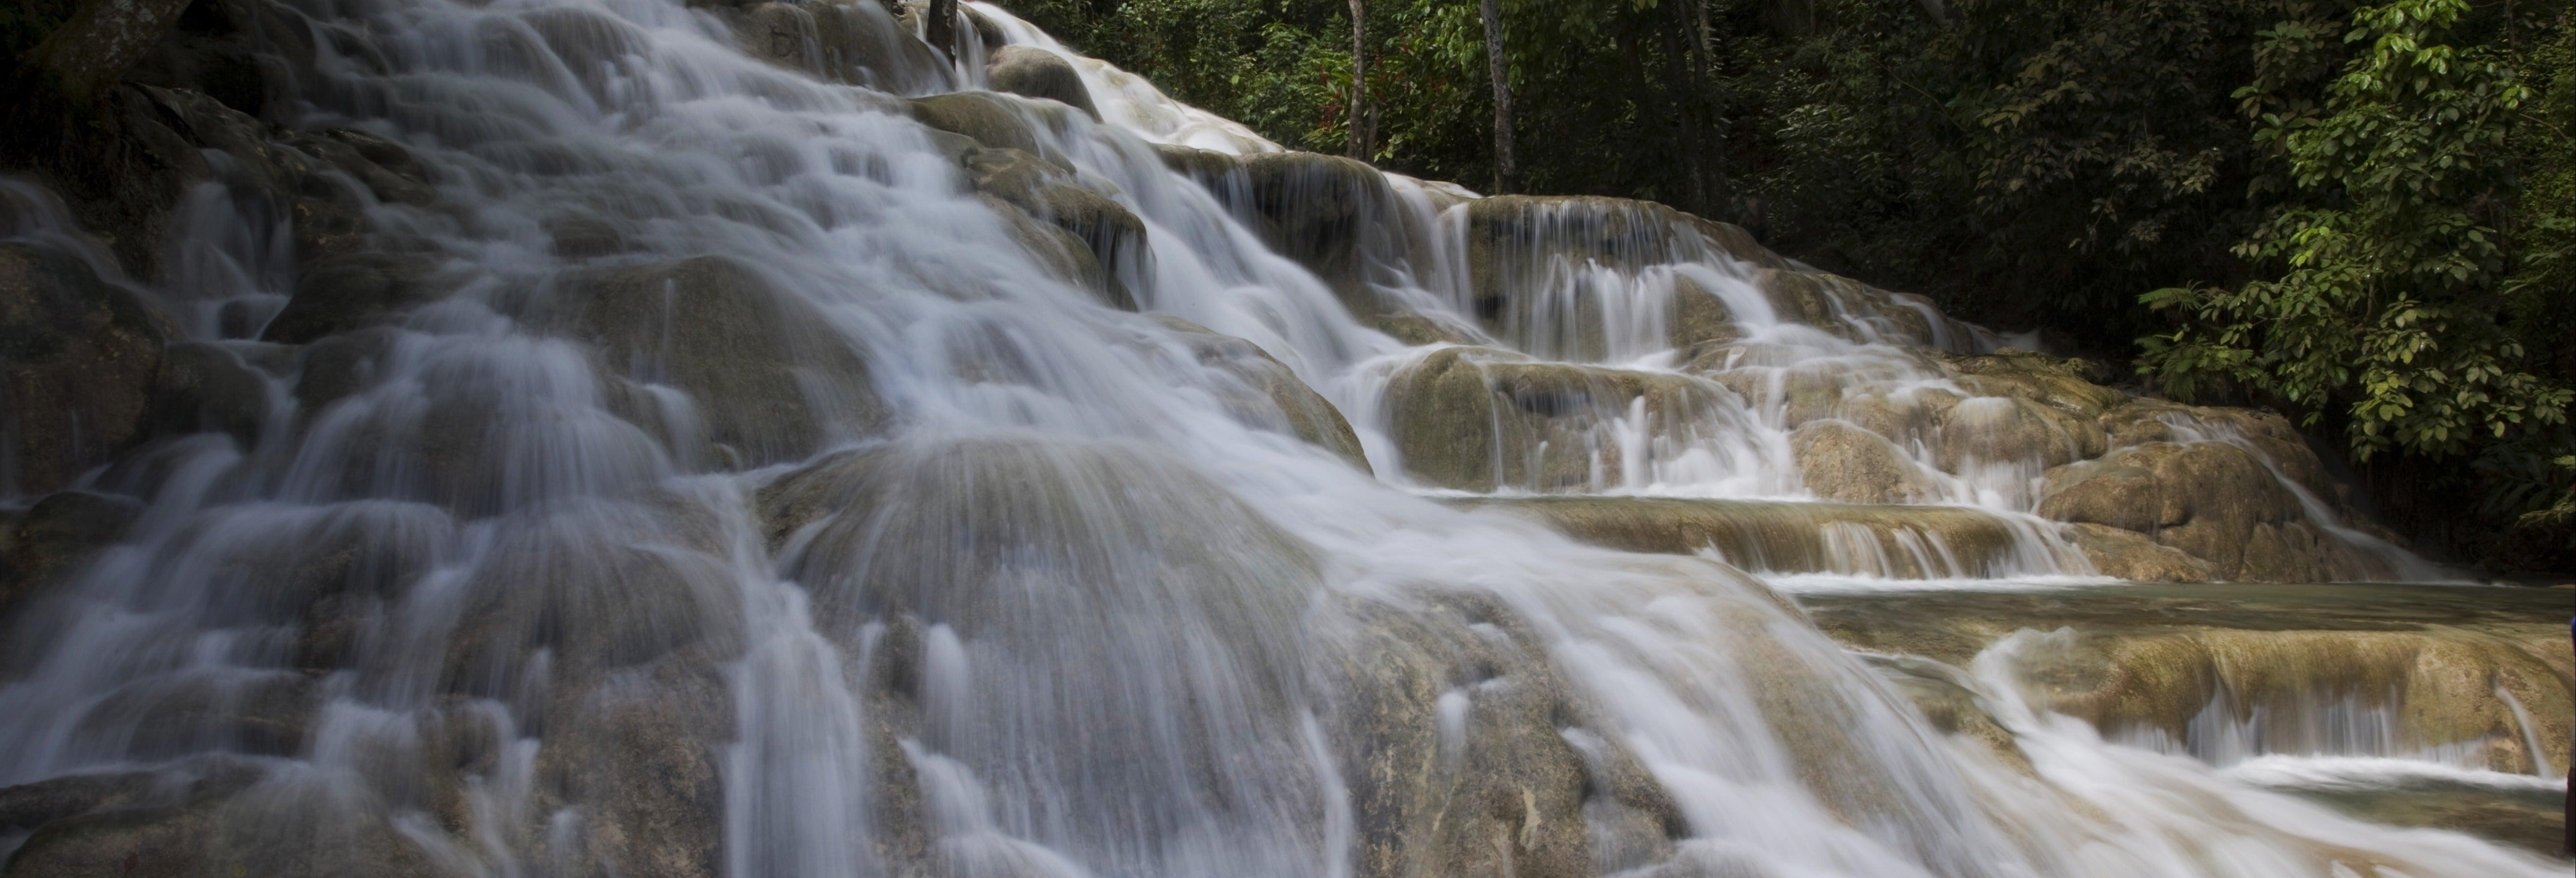 Bob Marley, Dunn's River Falls & Luminous Lagoon Tour